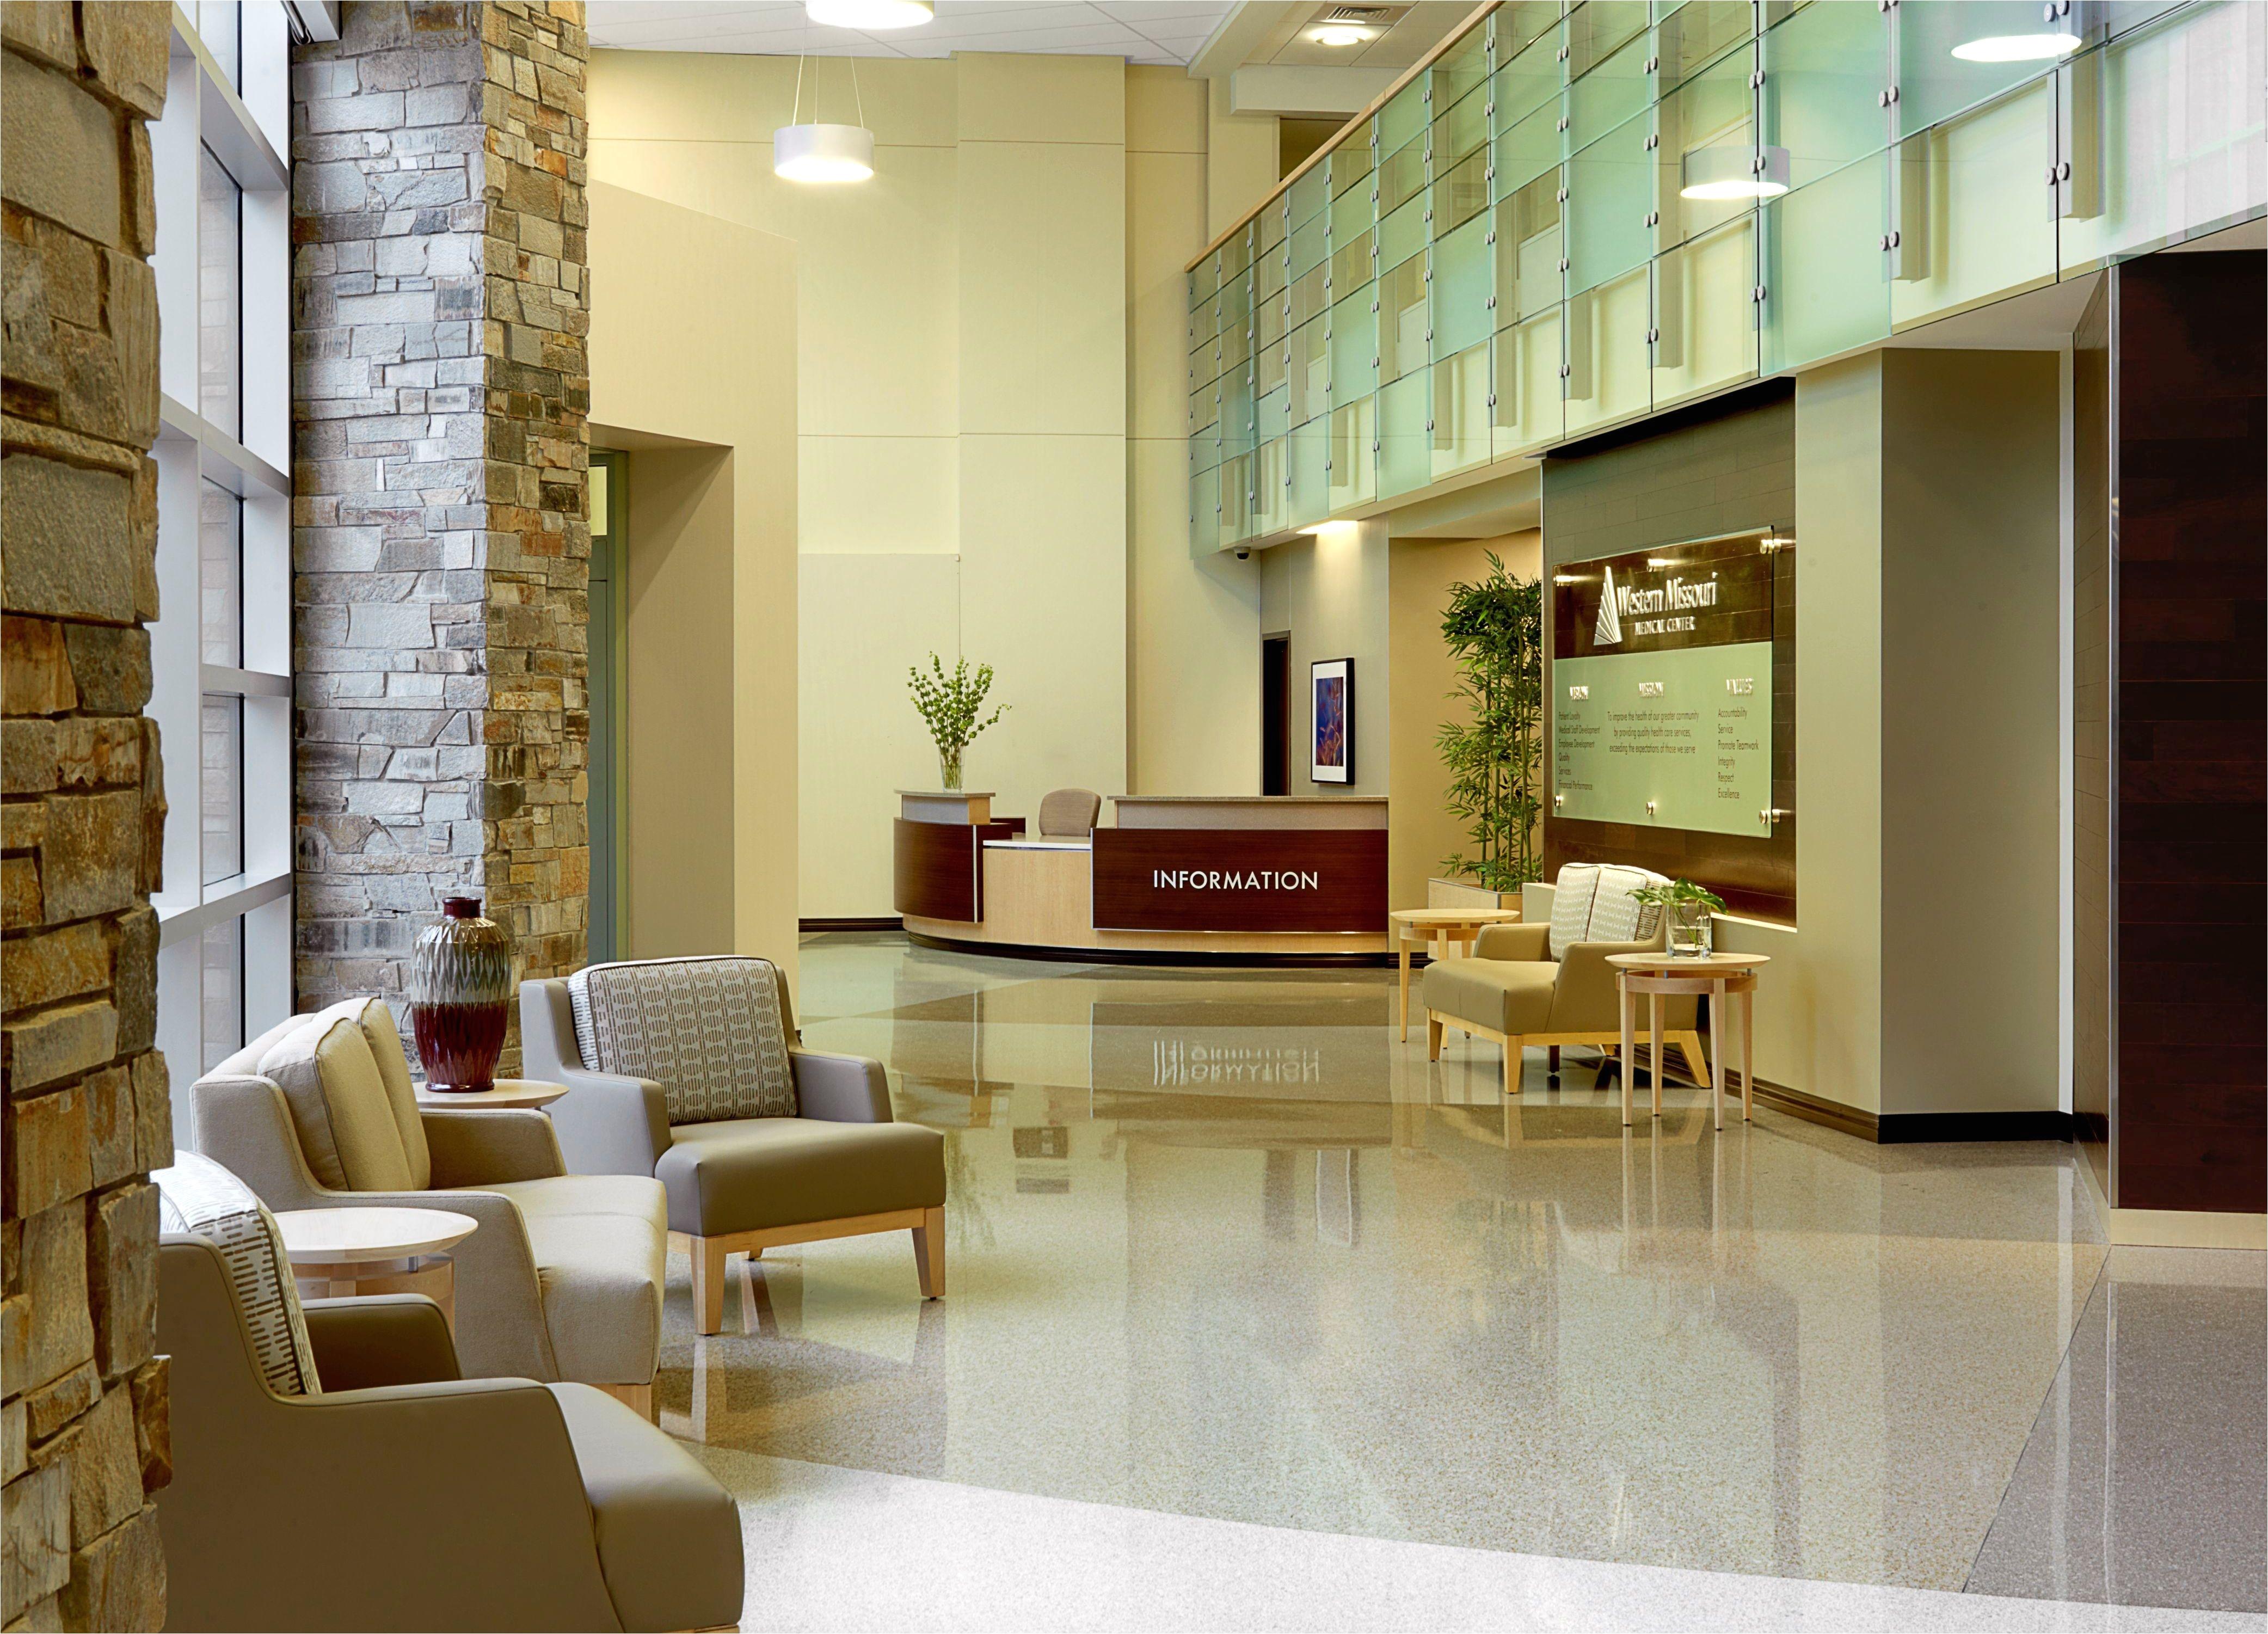 free online interior design courses with certificates uk rh bradshomefurnishings com